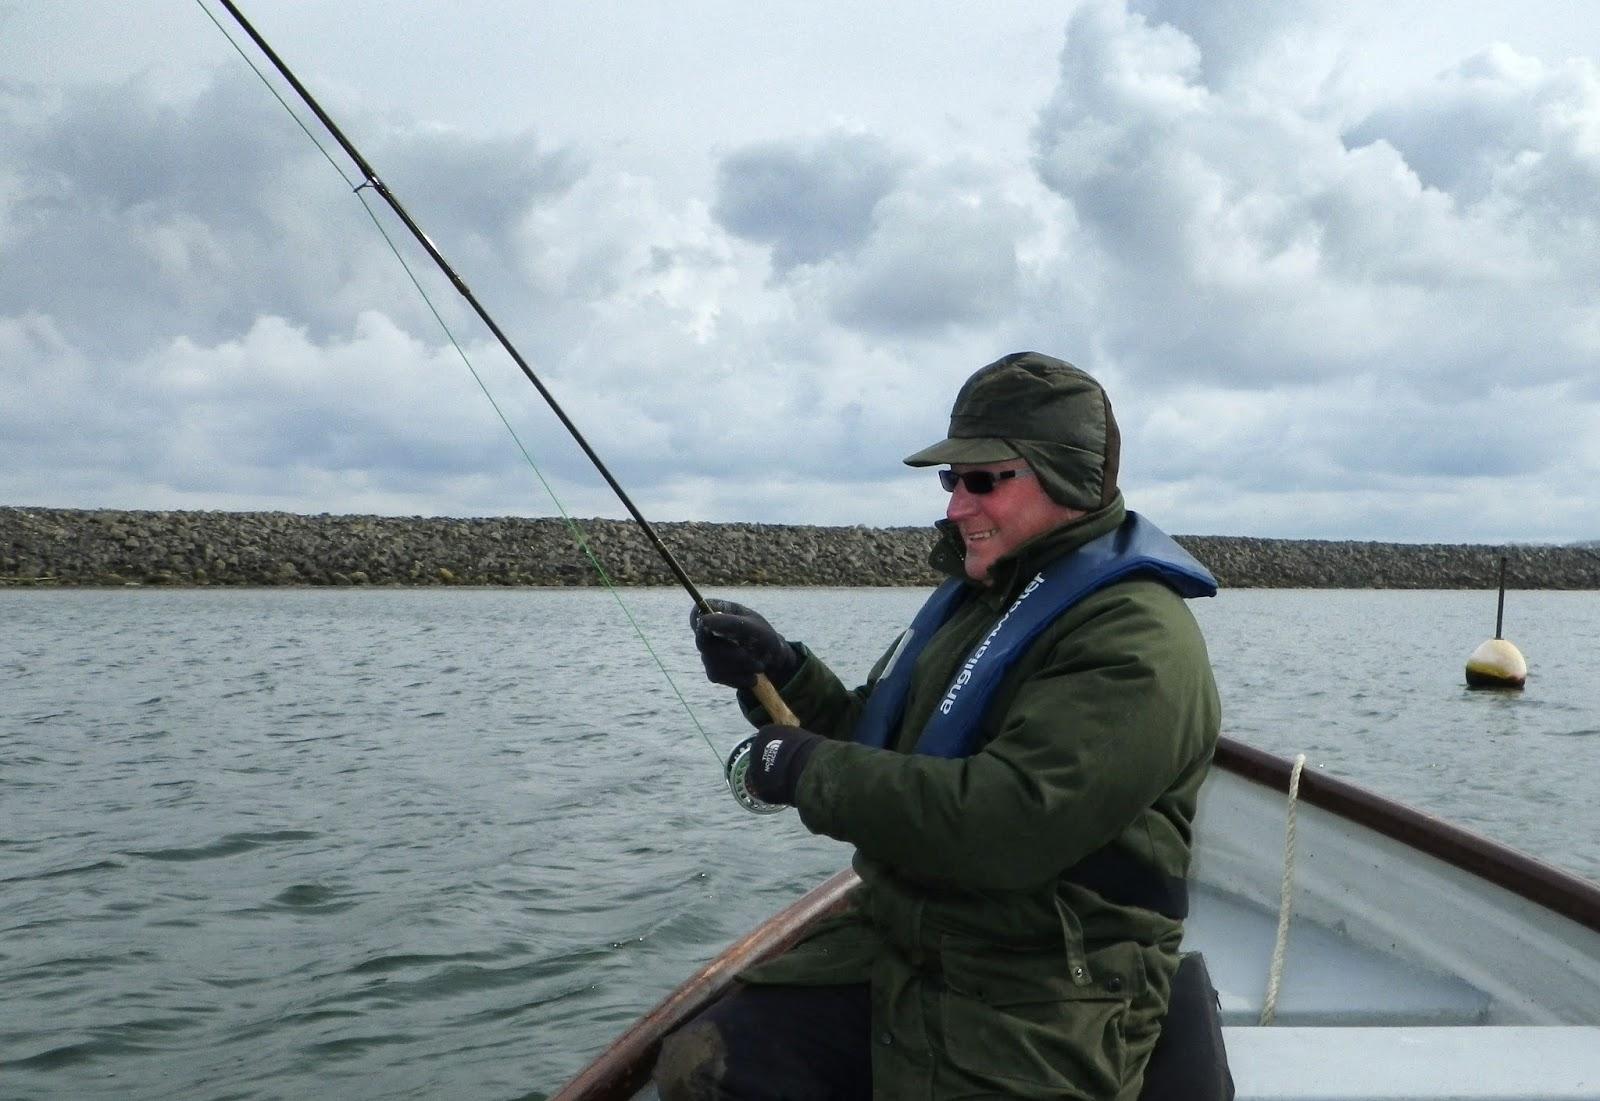 www.rutlandwaterflyfishing.co.uk